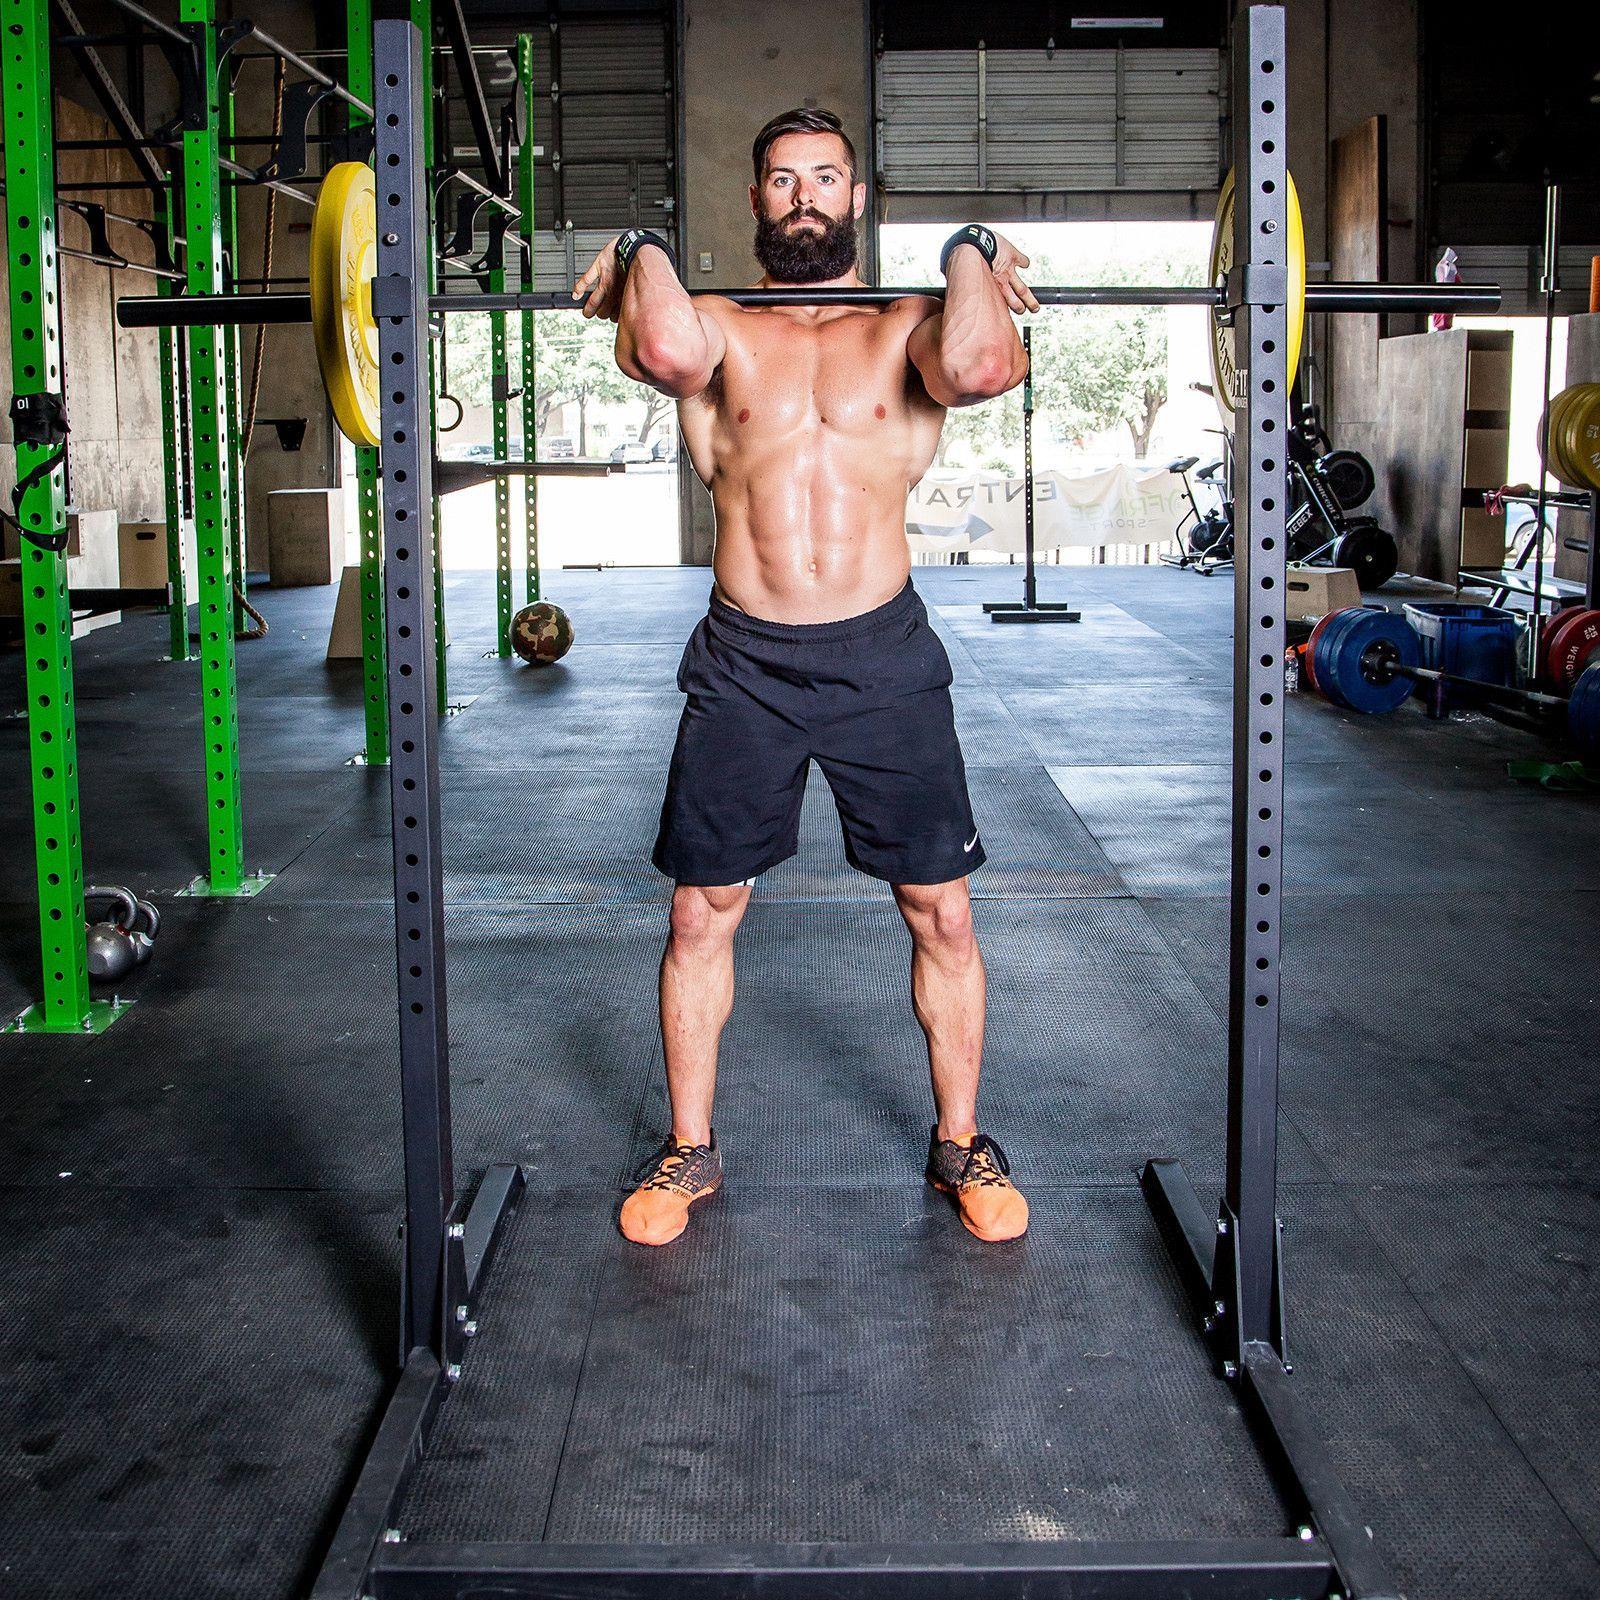 Commercial Squat Rack Squats, Power rack, Squat stands